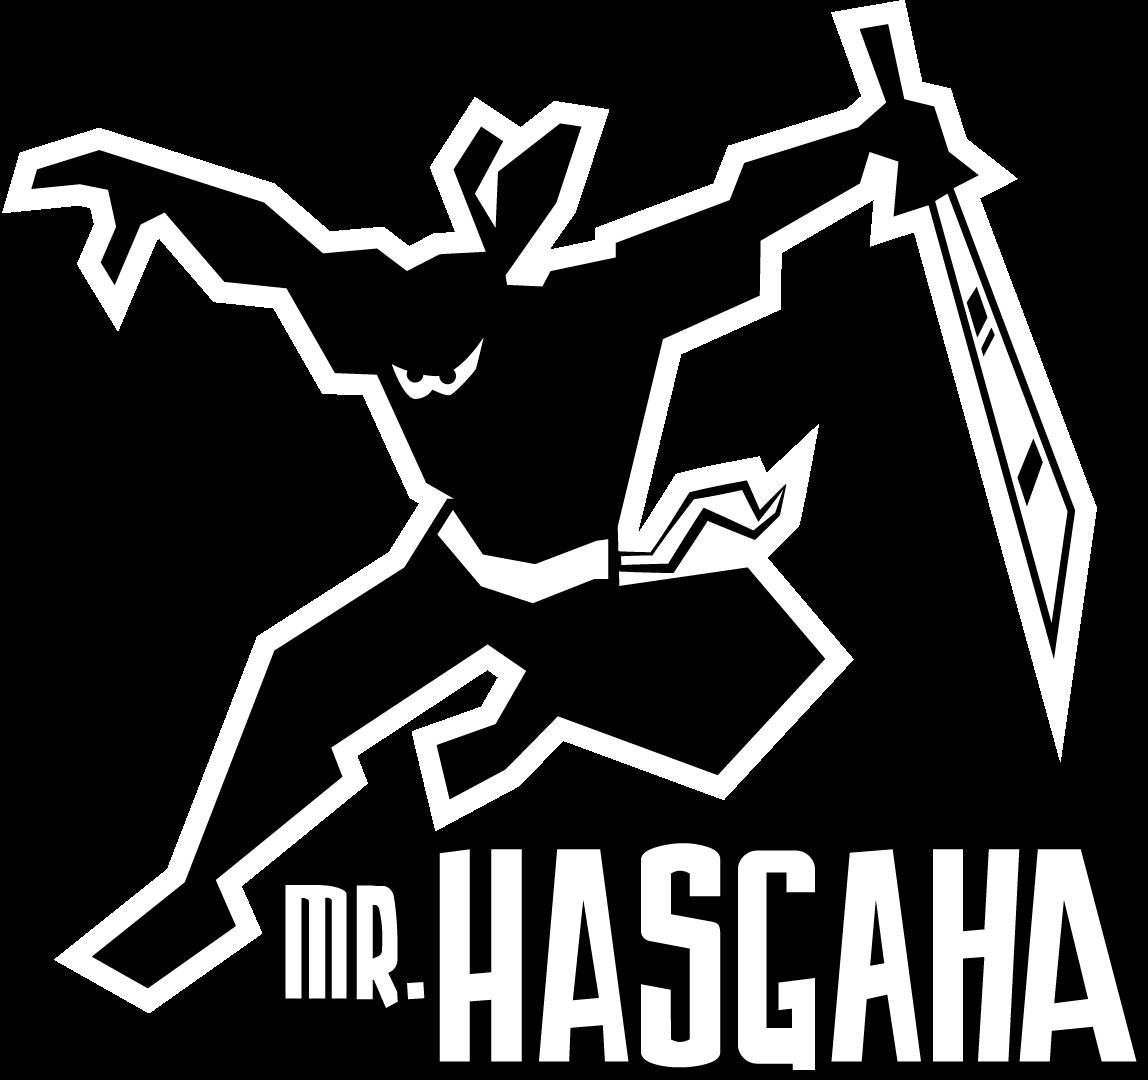 Hasgaha logo